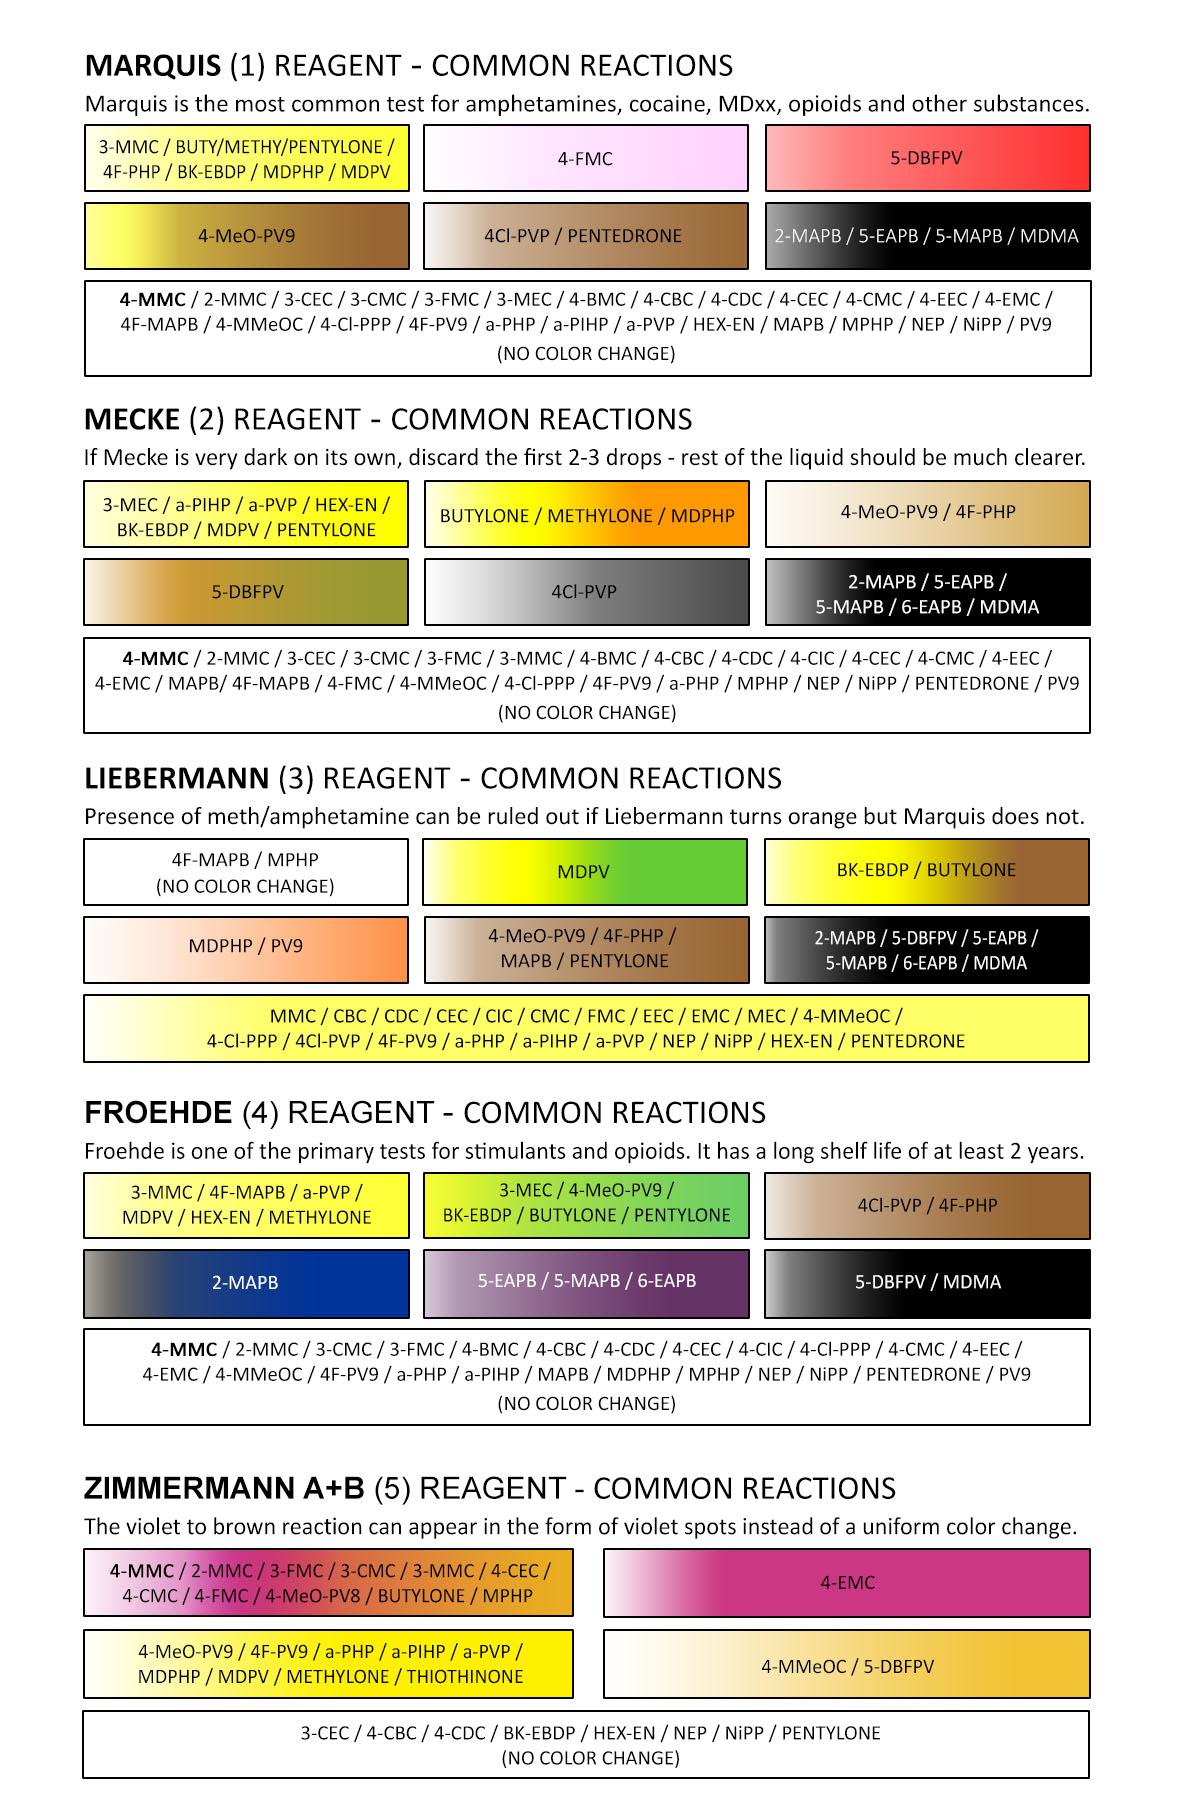 4-MMC Test Color Chart